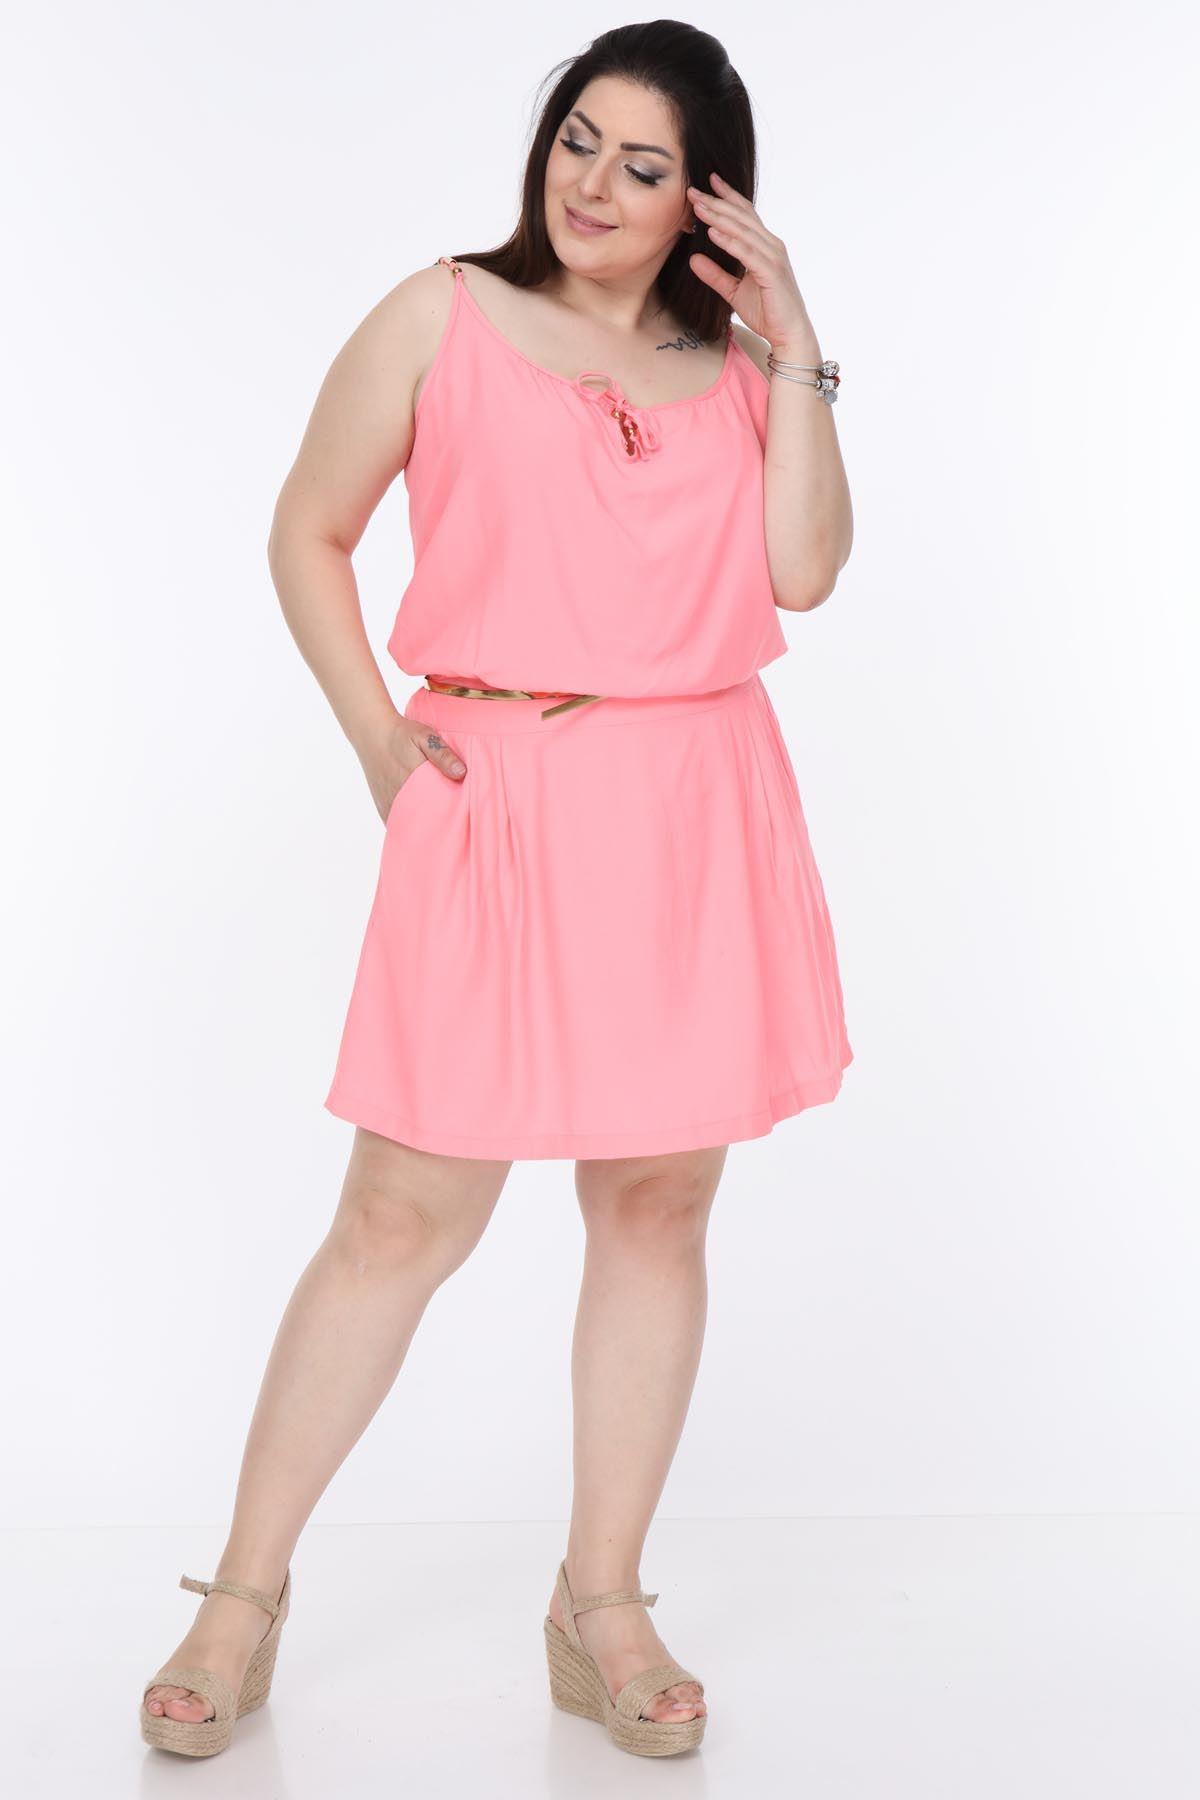 Pembe Askılı Elbise 21D-1055